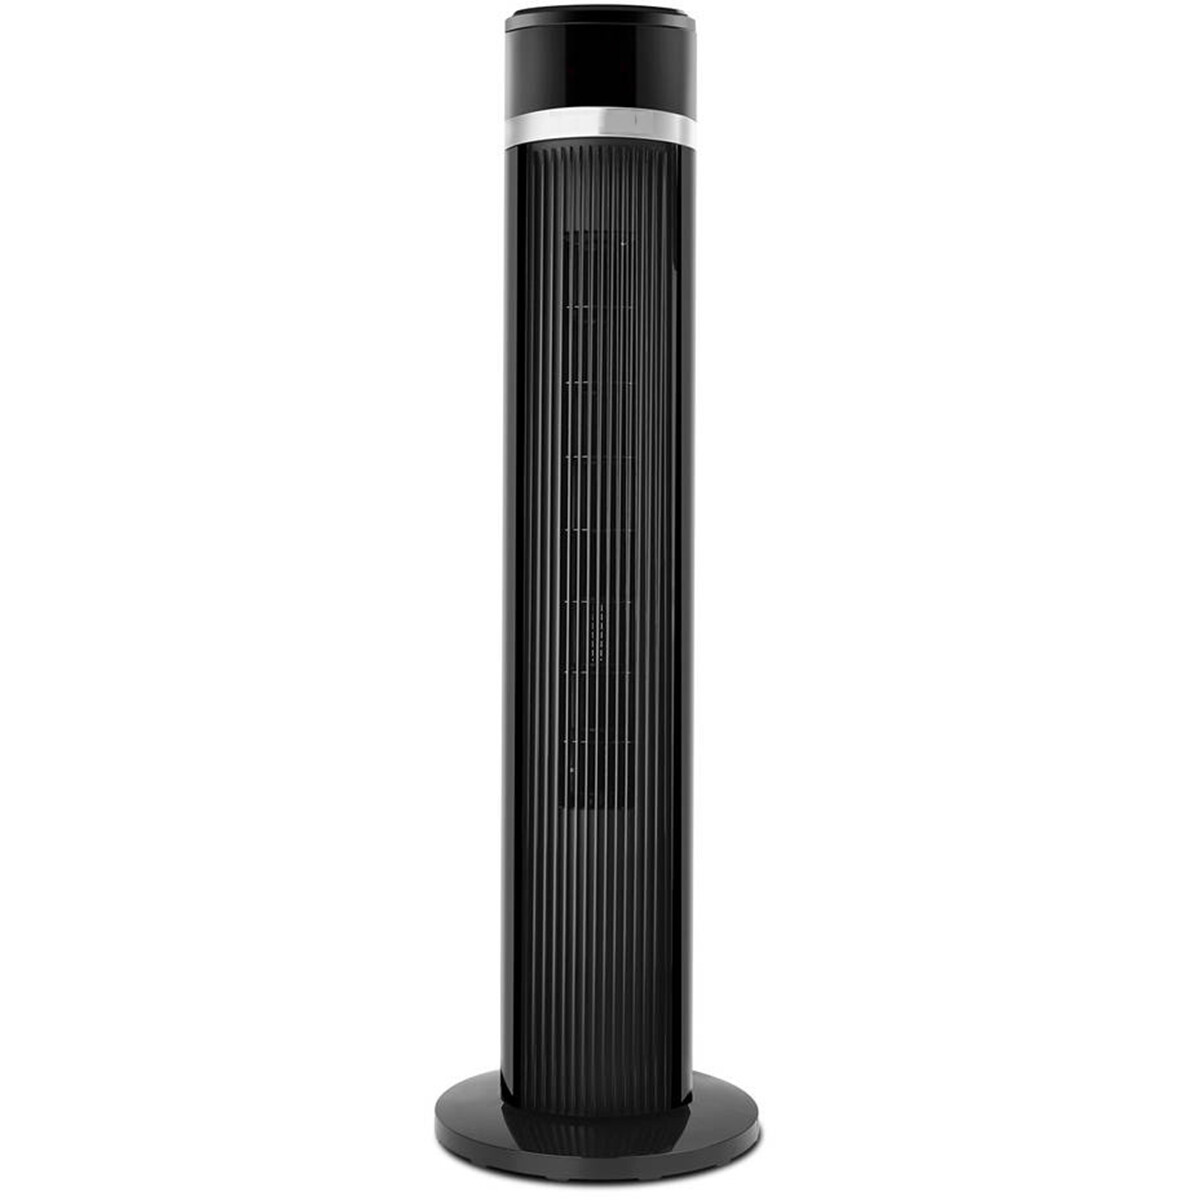 Ventilator - Aigi Islo - 35W - Tafelventilator - Staand - Rond - Mat Zwart - Kunststof